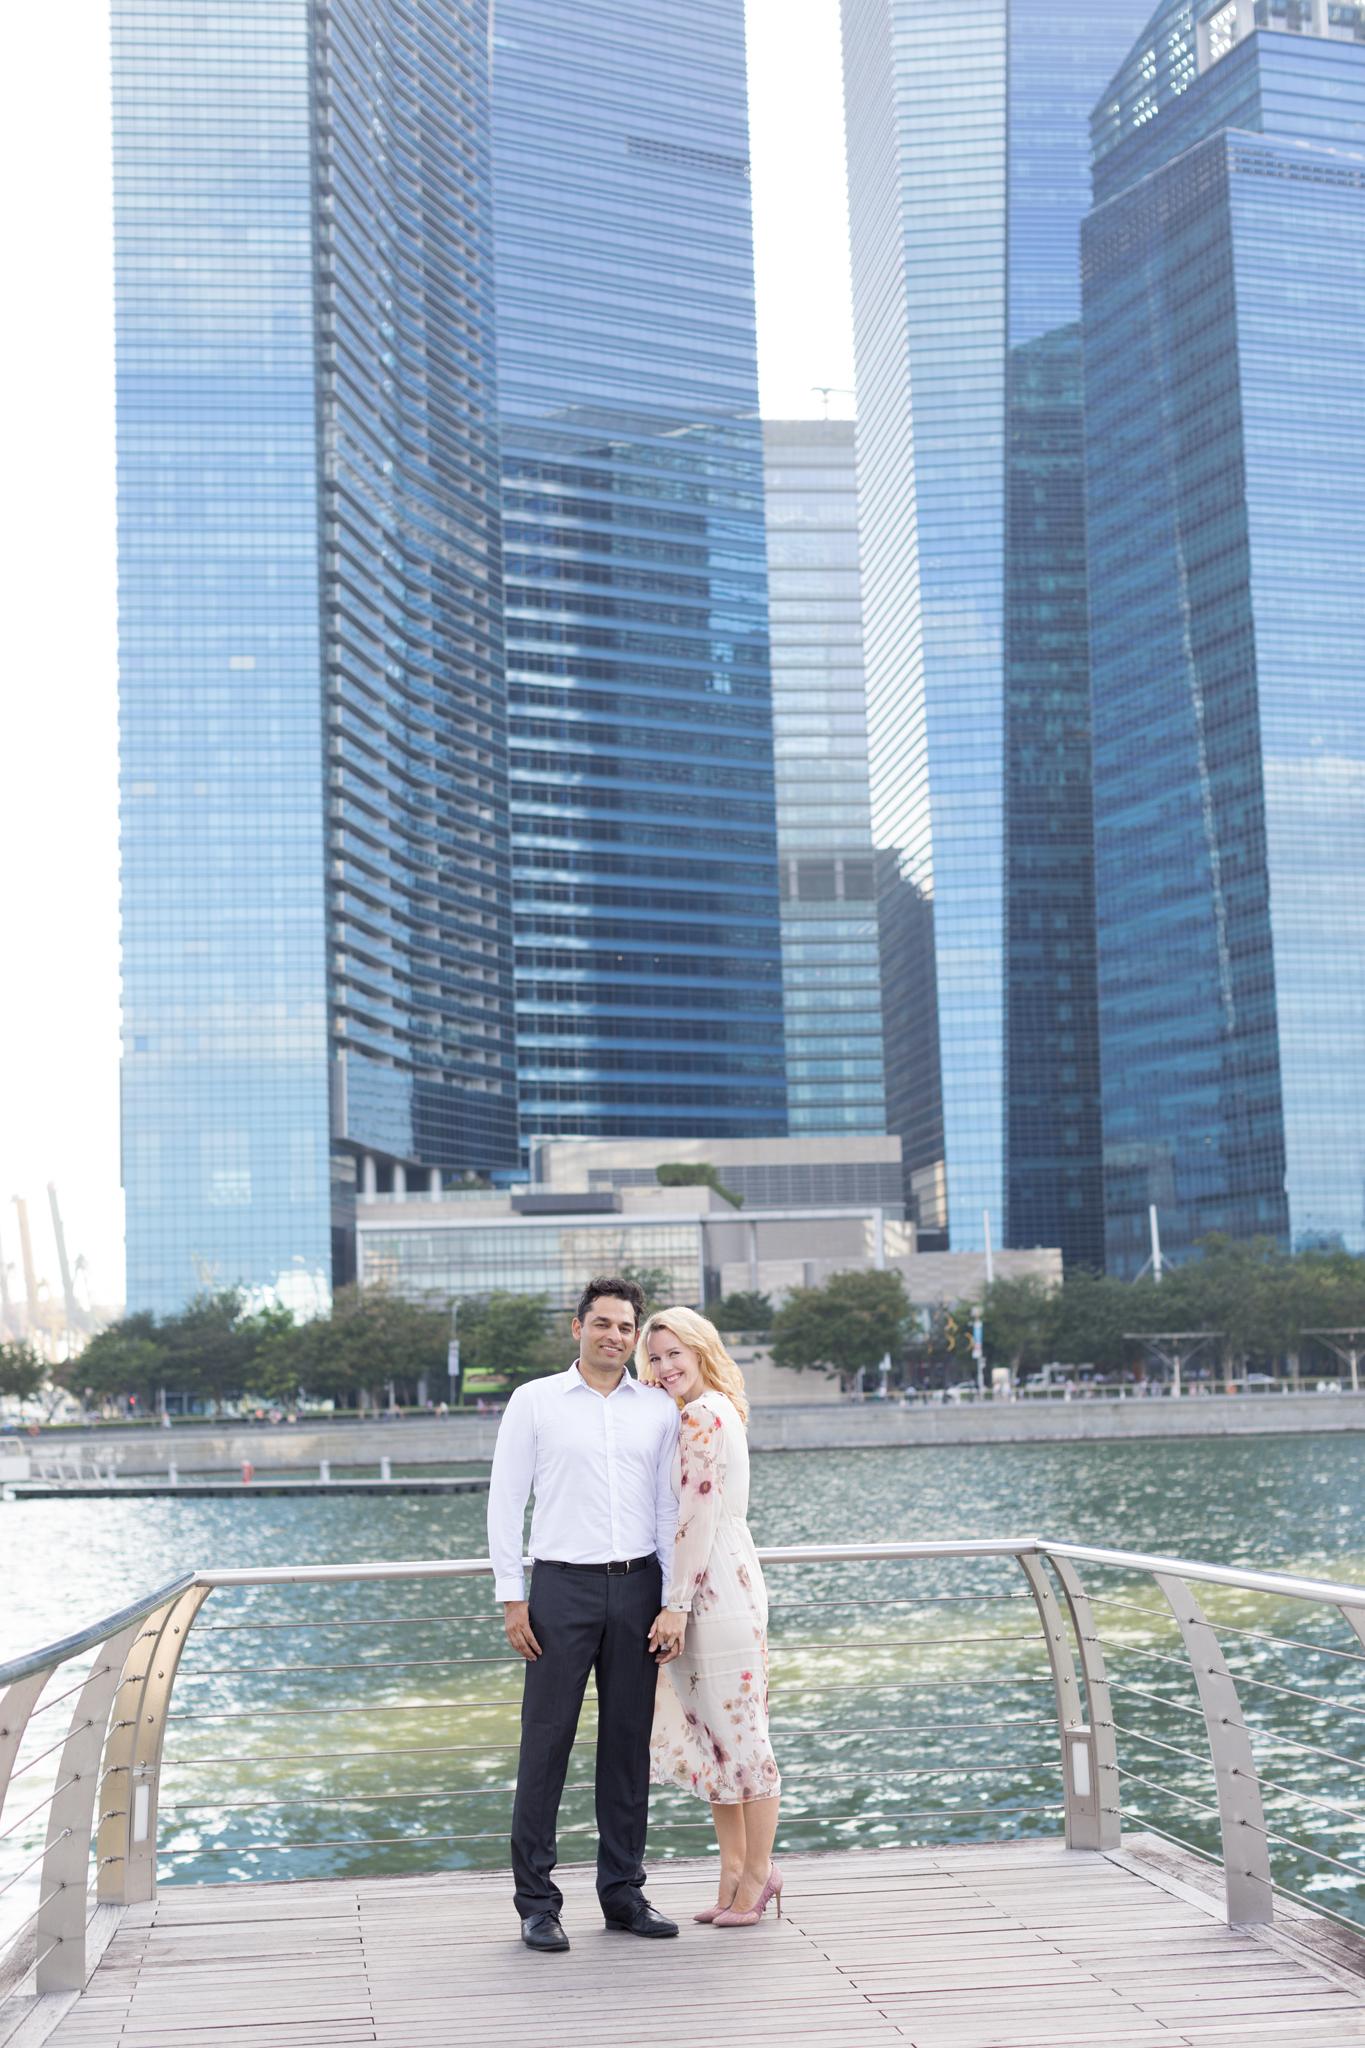 marina-bay-sands- couple-photoshoot-family-photographer-singapore-natural-light-photographer-candid-authentic-svensk-fotograf-singapore